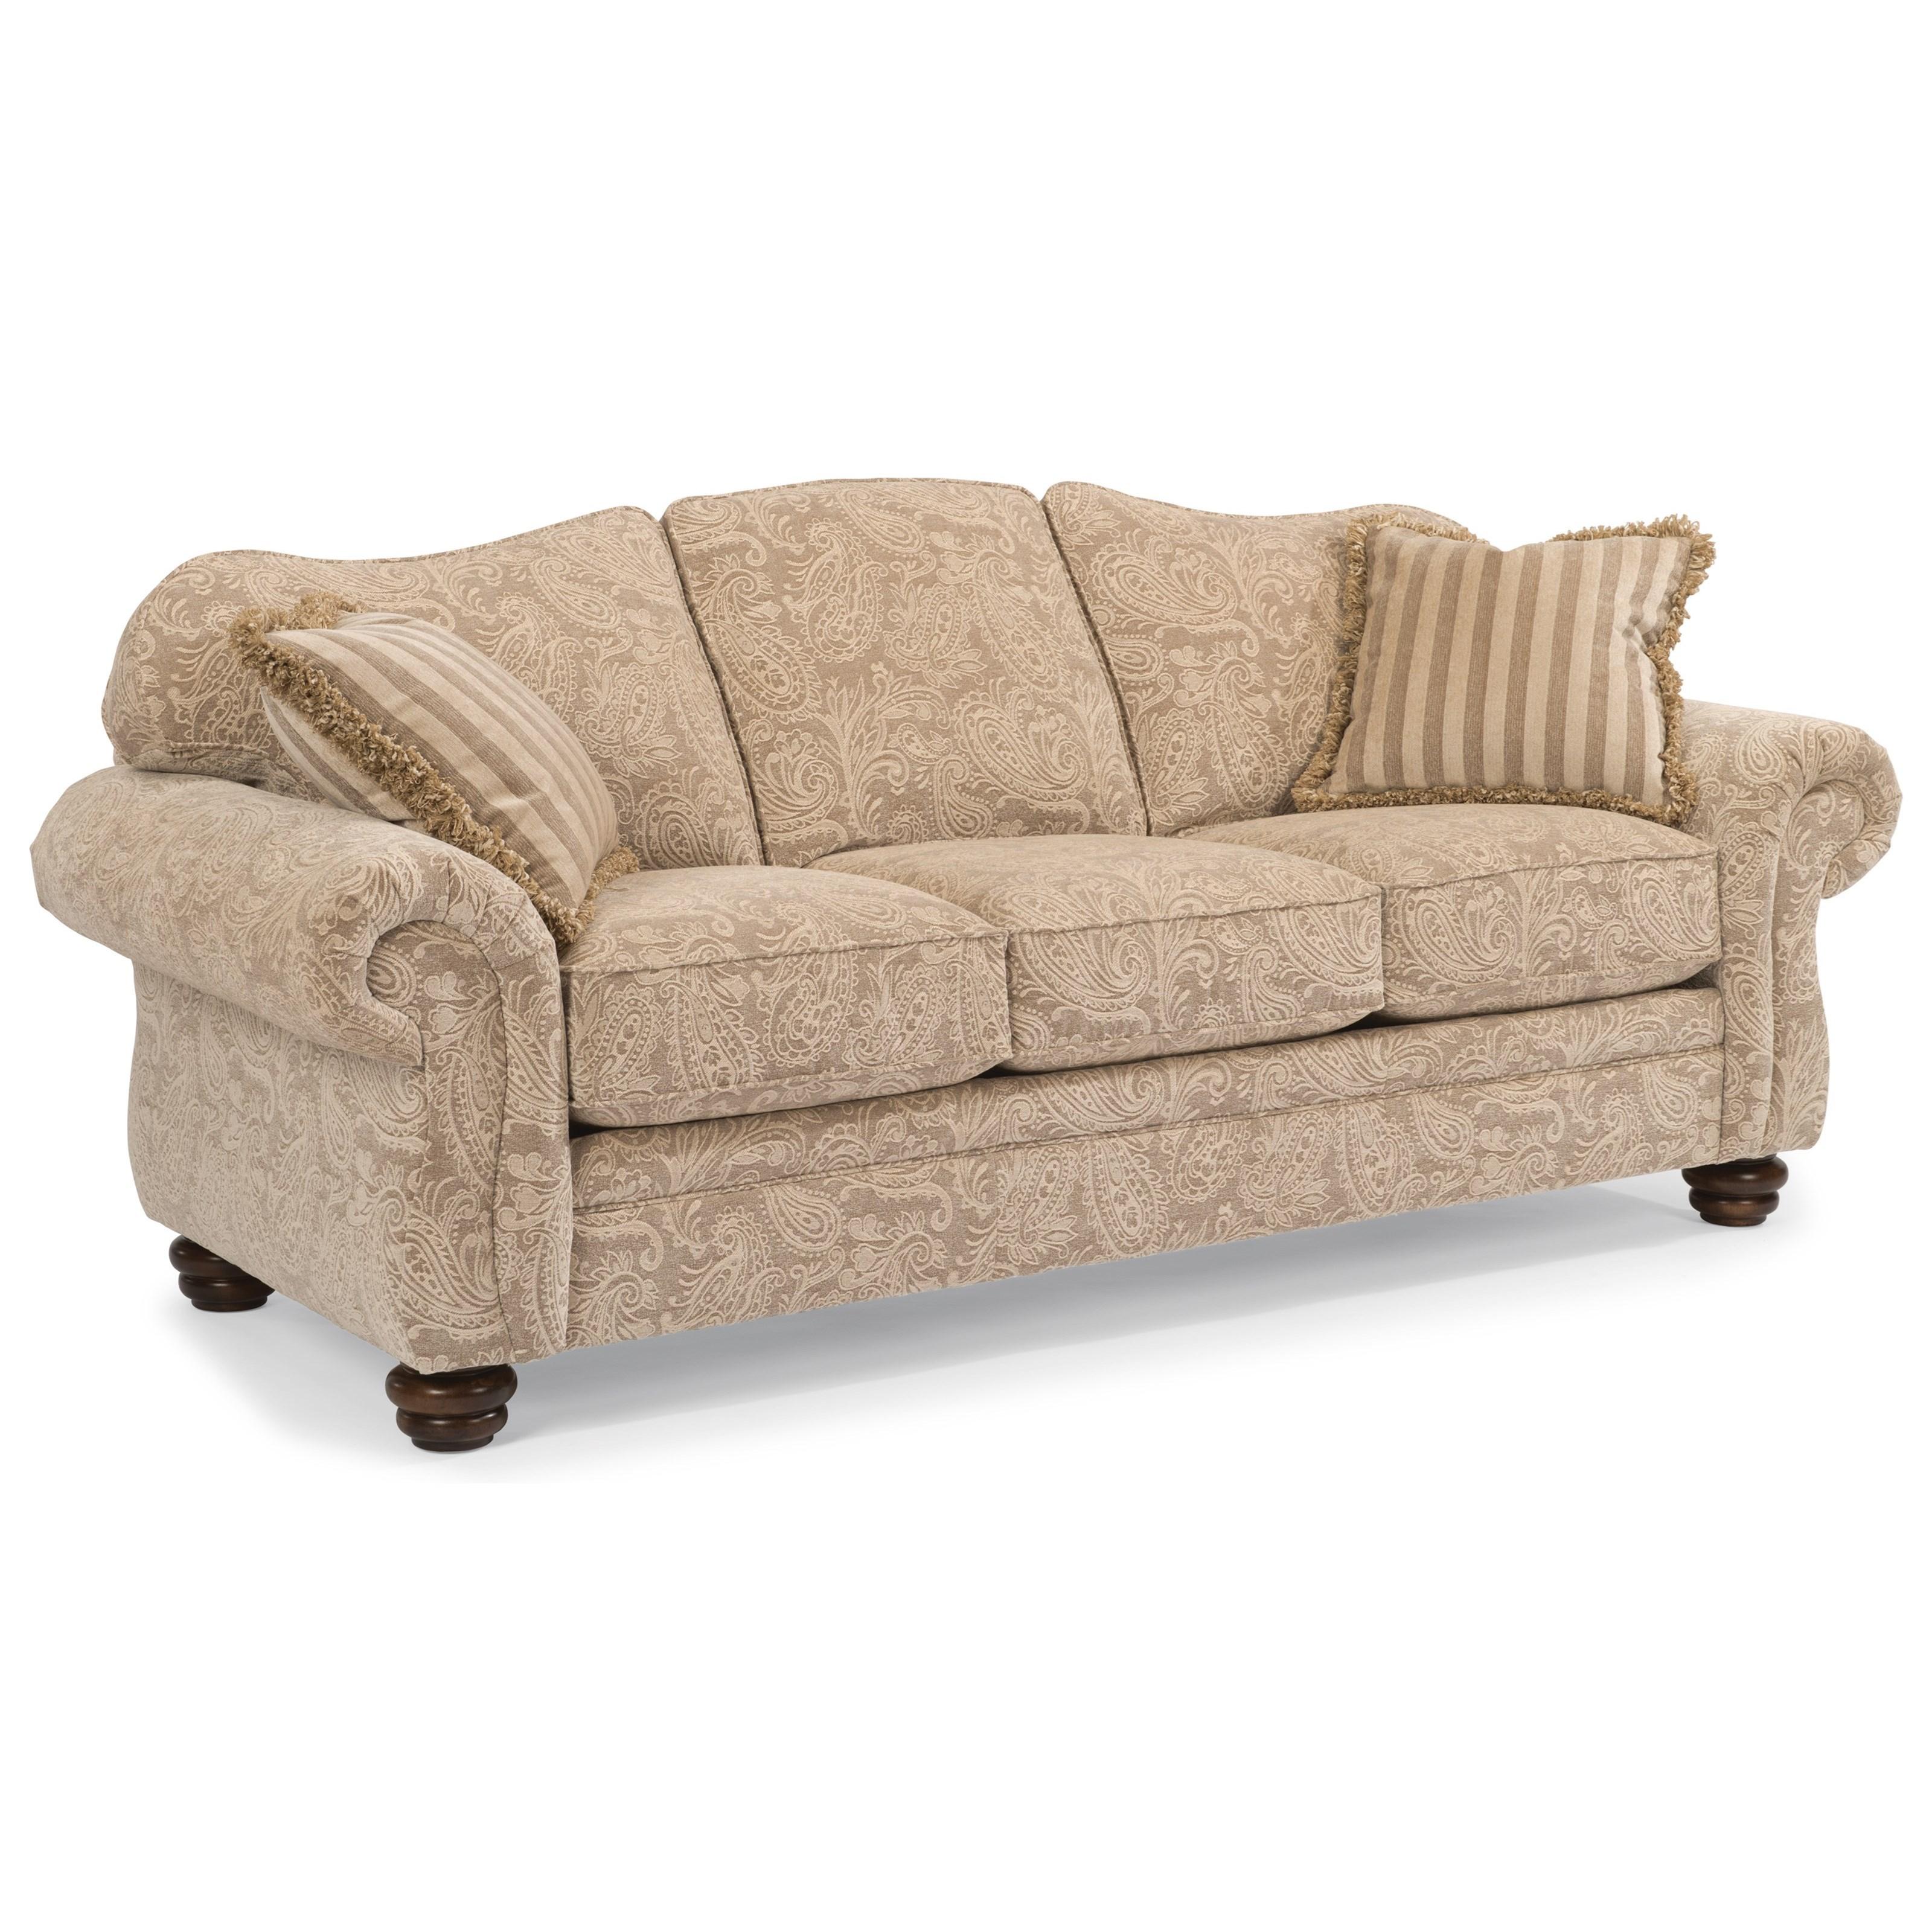 flexsteel bexley 8646 31 traditional sofa furniture and rh furnitureappliancemart com